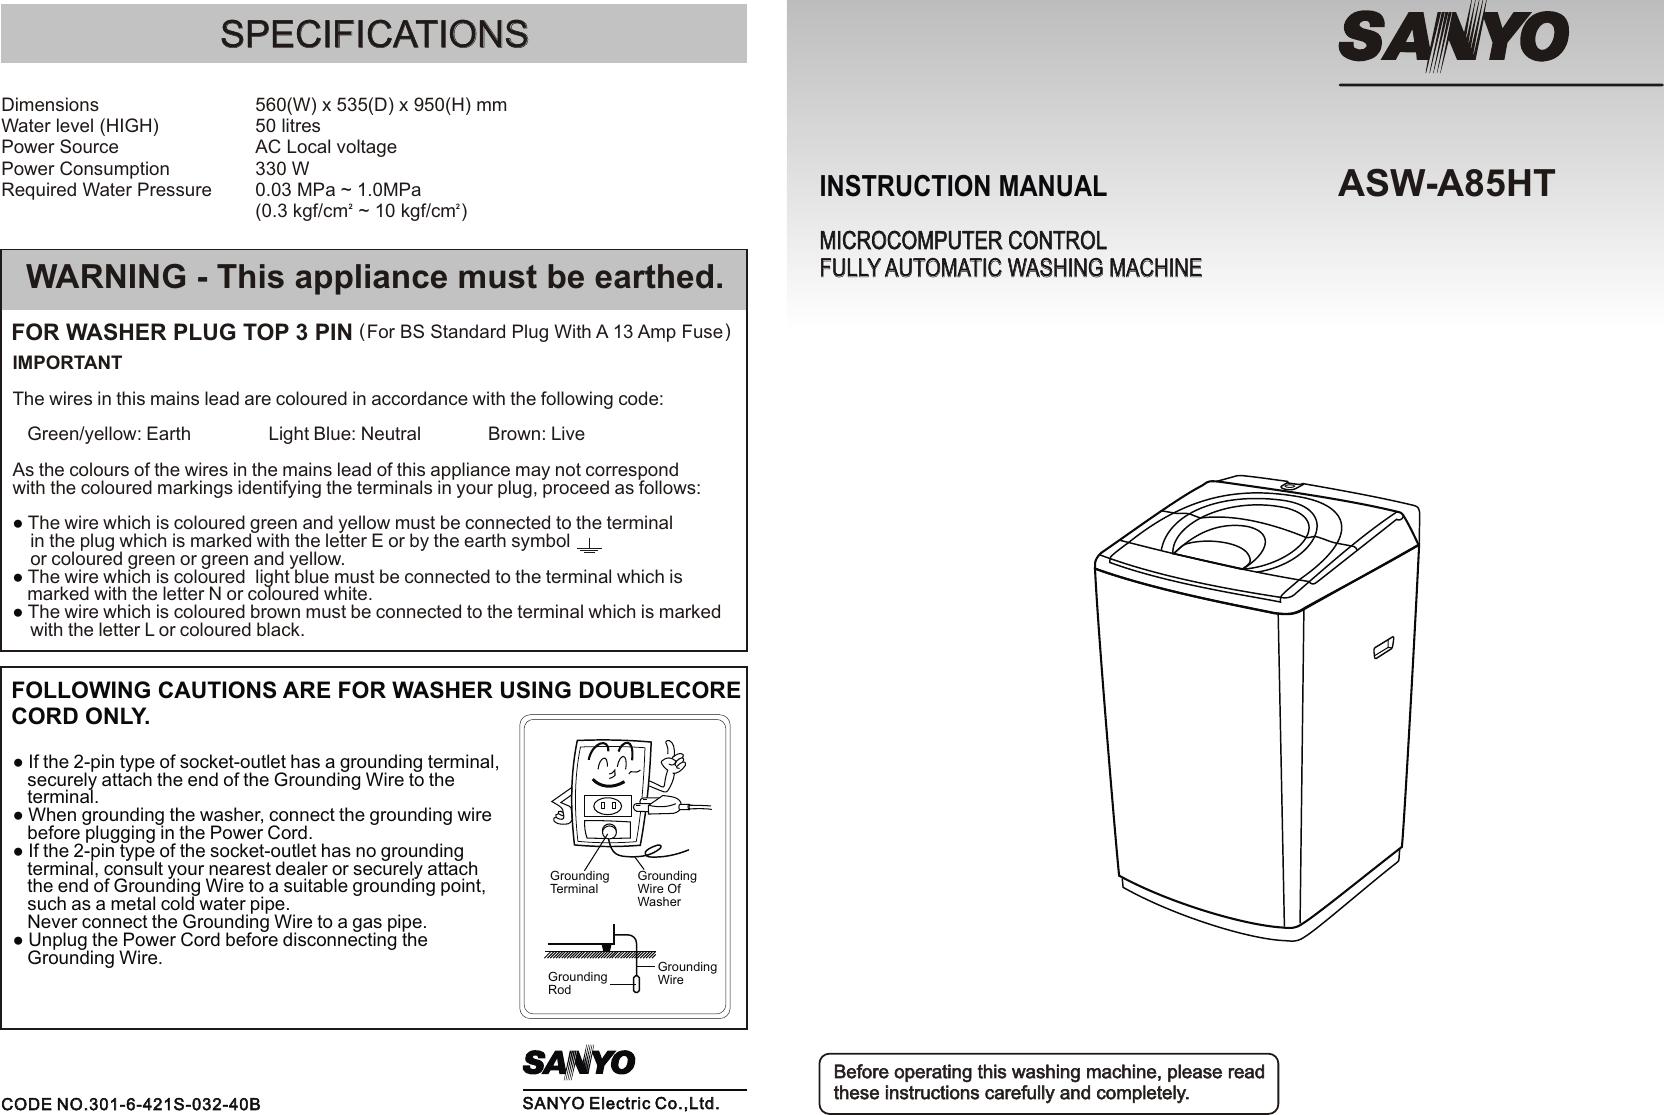 sanyo washer asw a85ht users manual a85ht rh usermanual wiki sanyo aqua washing machine manual sanyo washing machine instruction manual